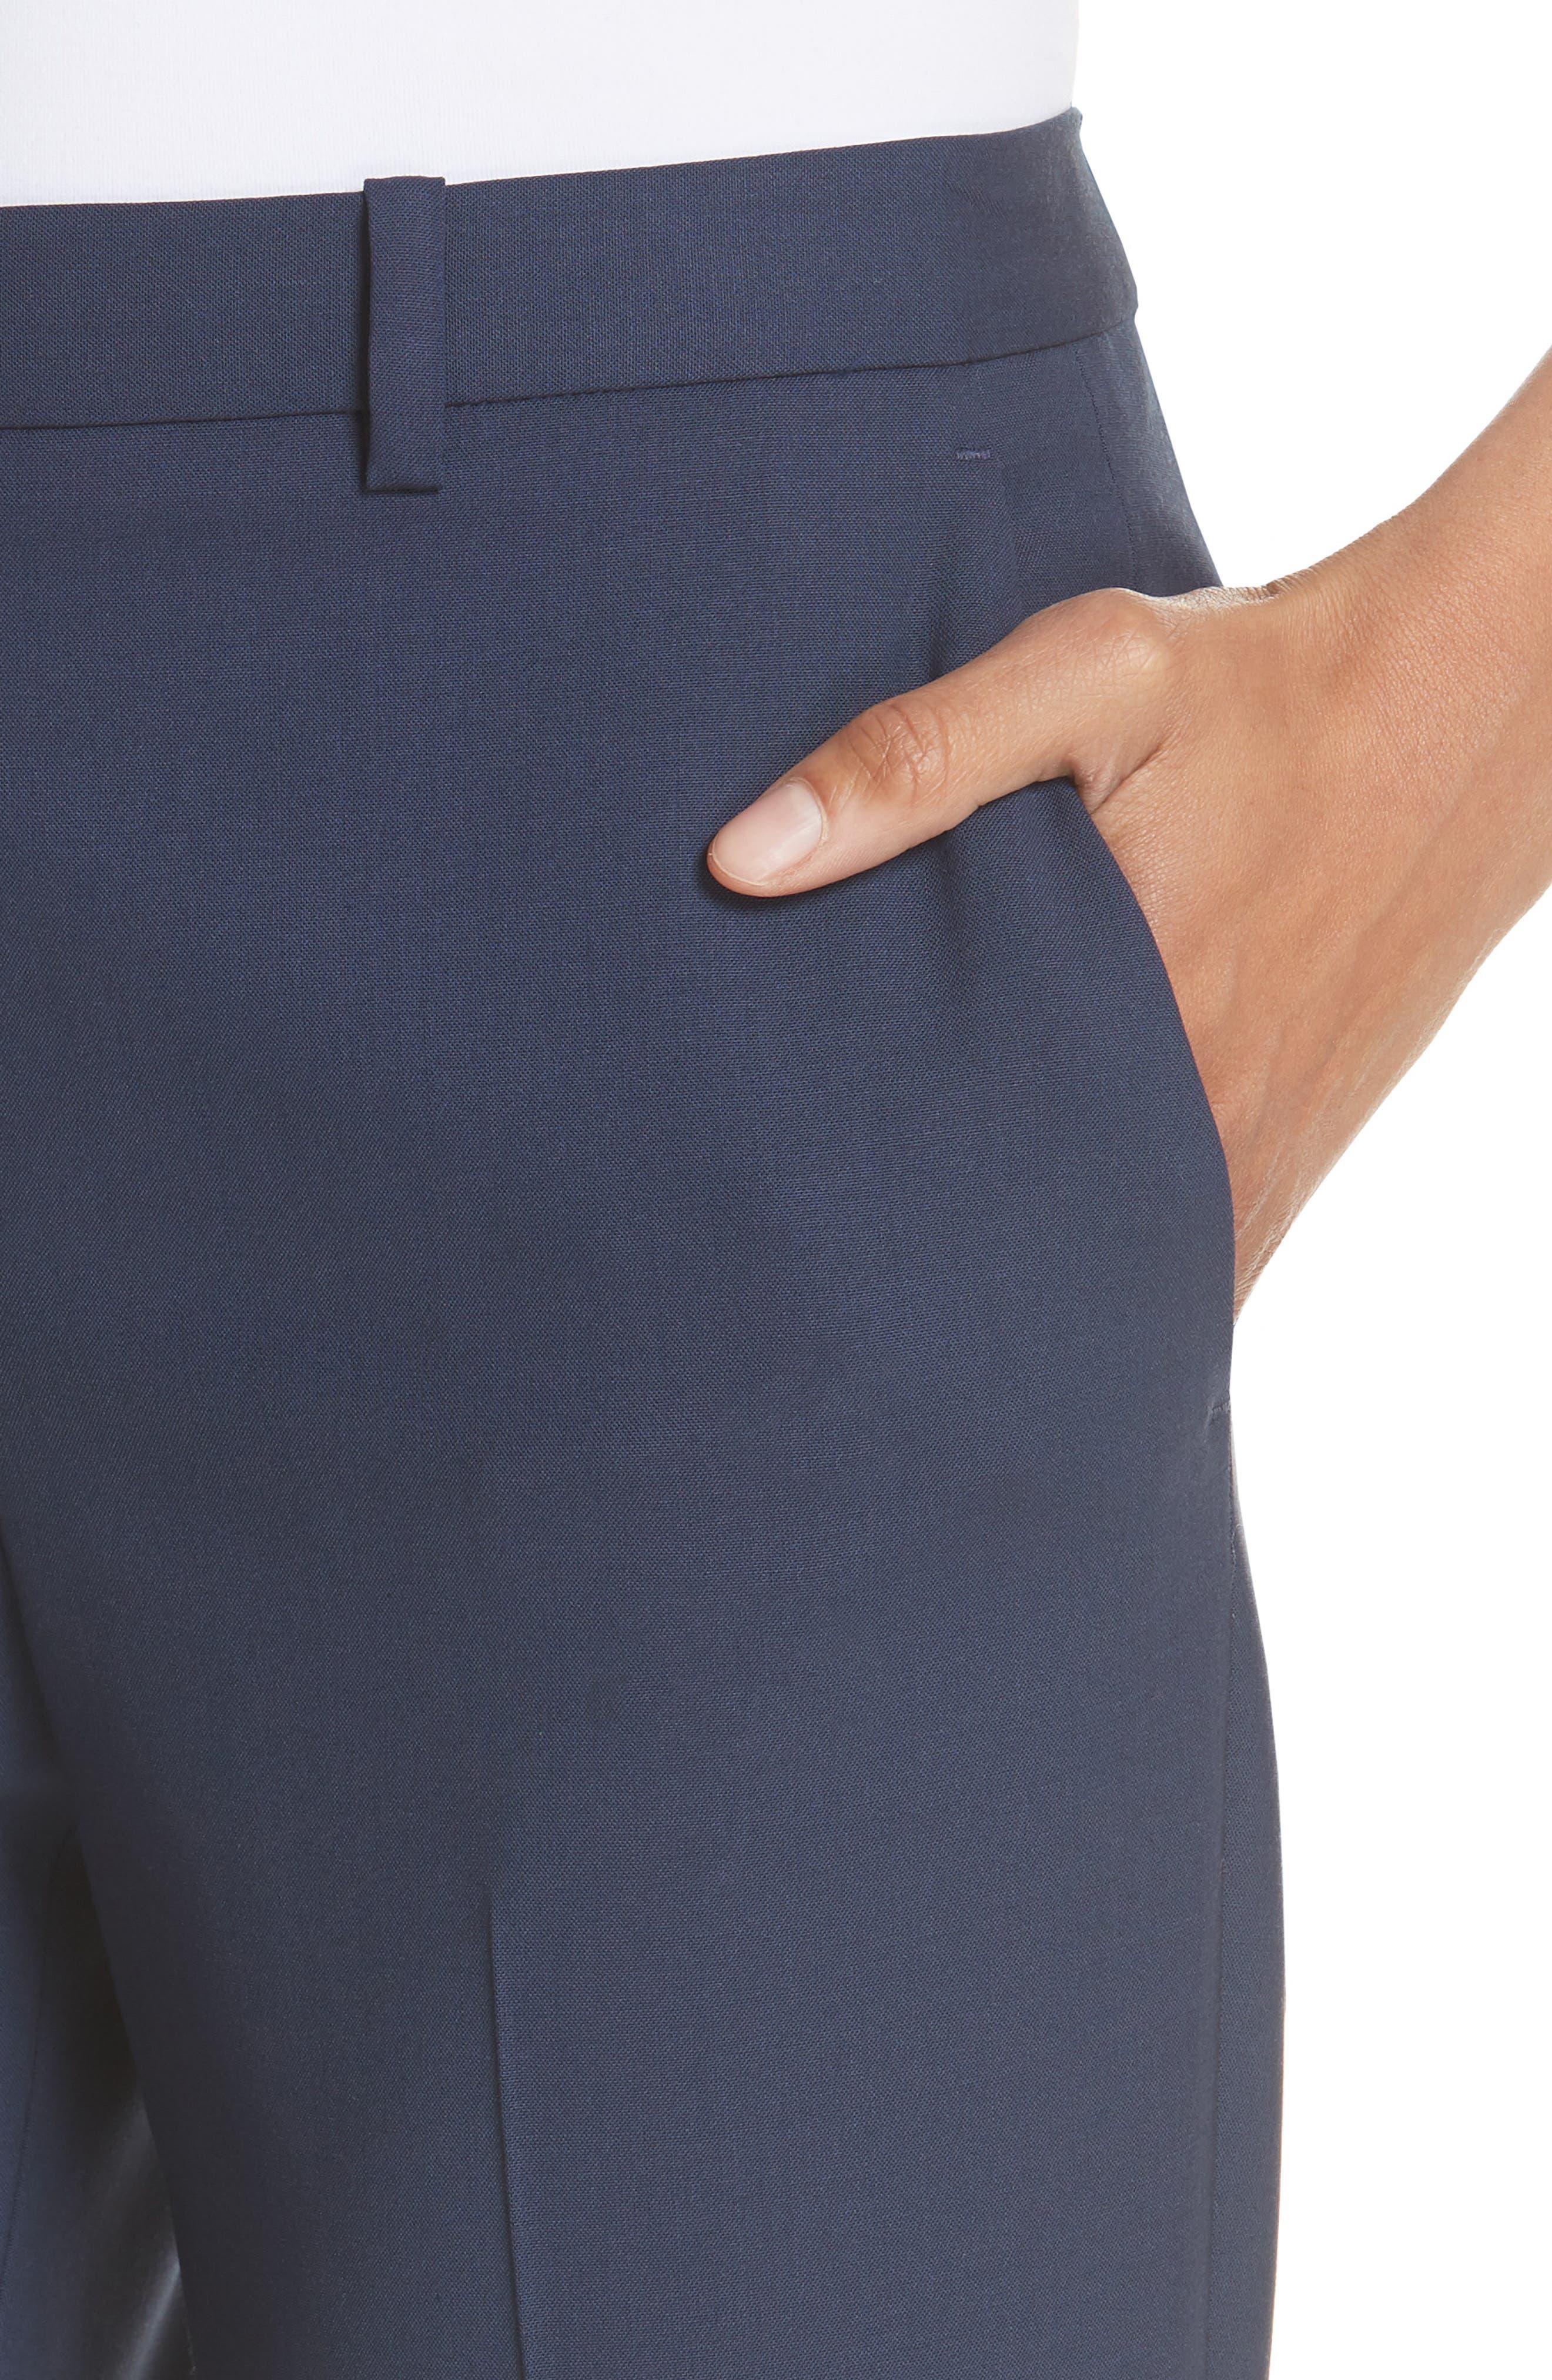 Demitria 2 Stretch Wool Suit Pants,                             Alternate thumbnail 15, color,